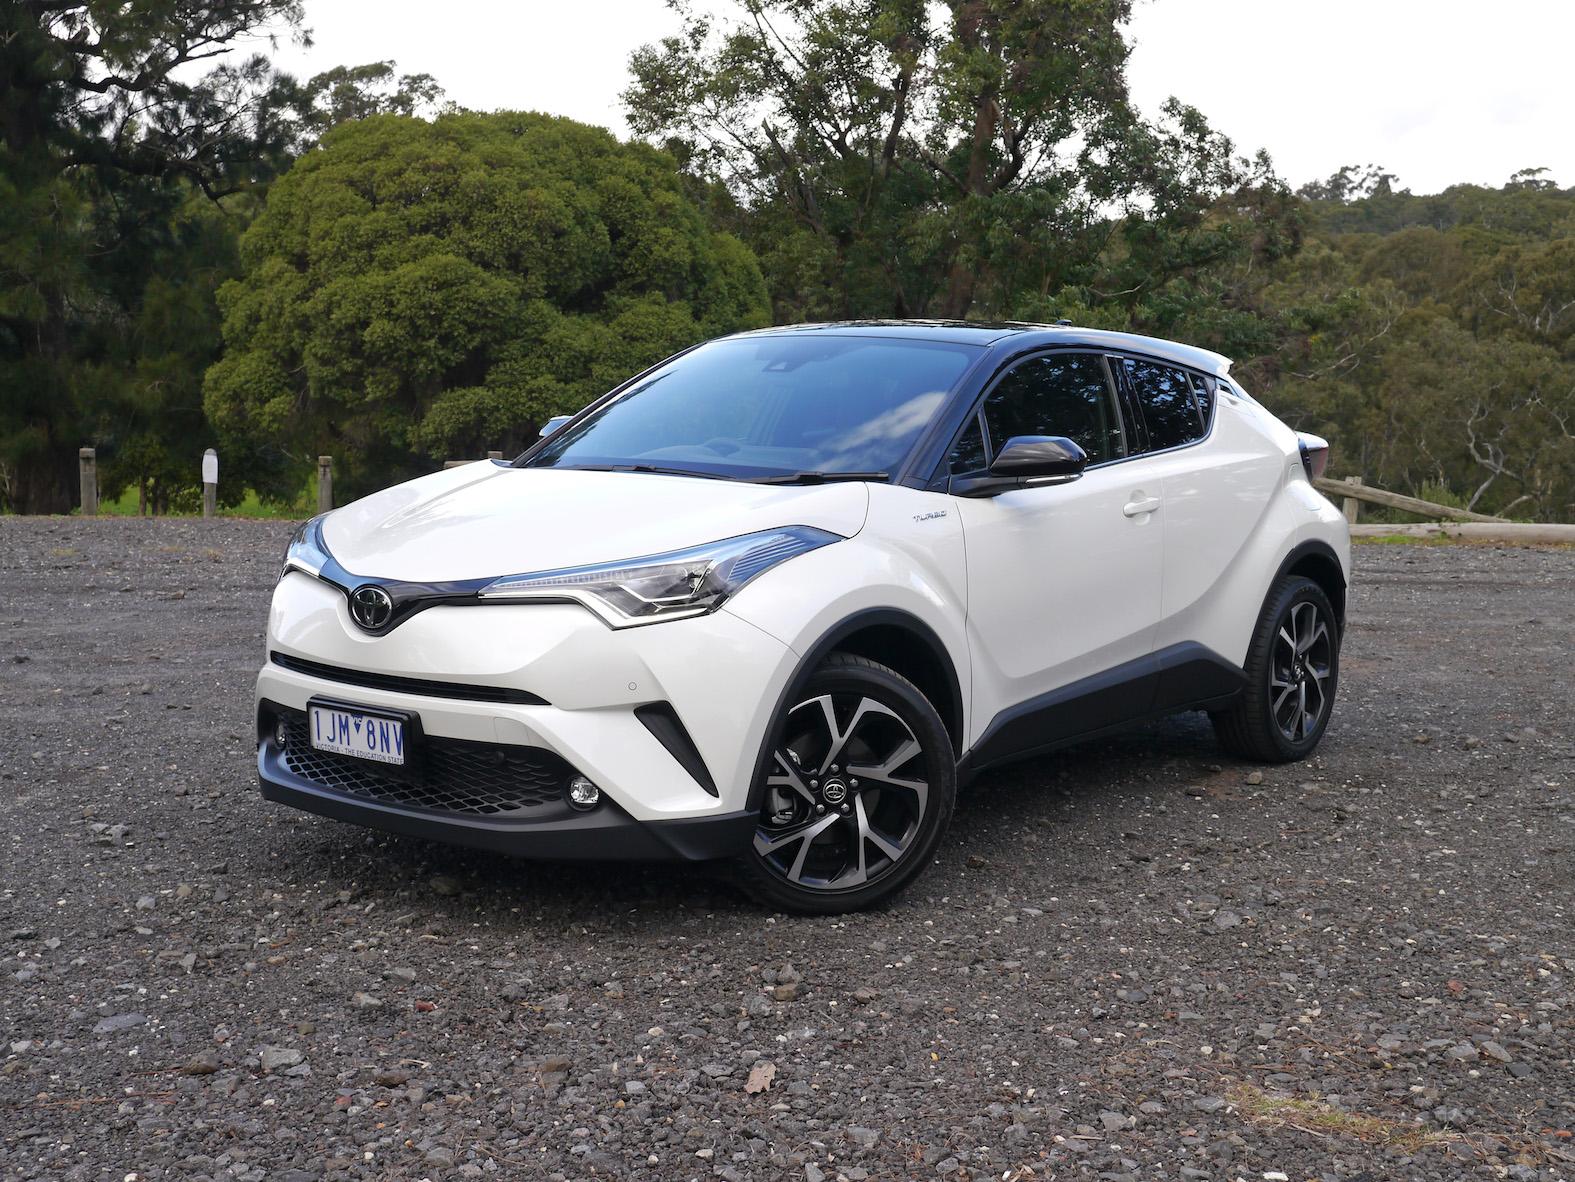 Toyota Recalls C-HR SUV And Tarago People Mover